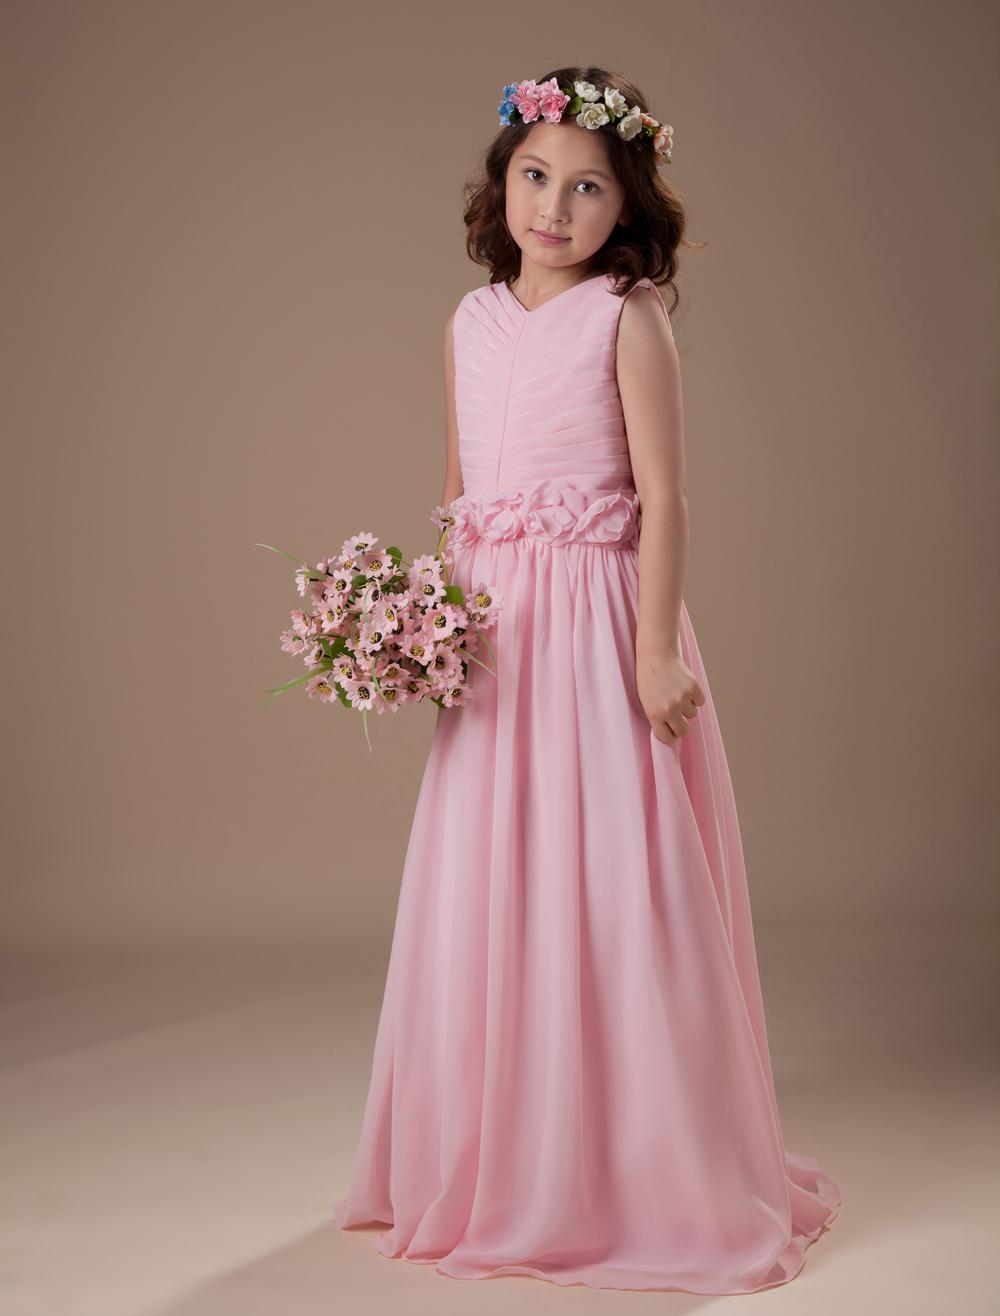 Girls flower dresses chiffon exclusive photo